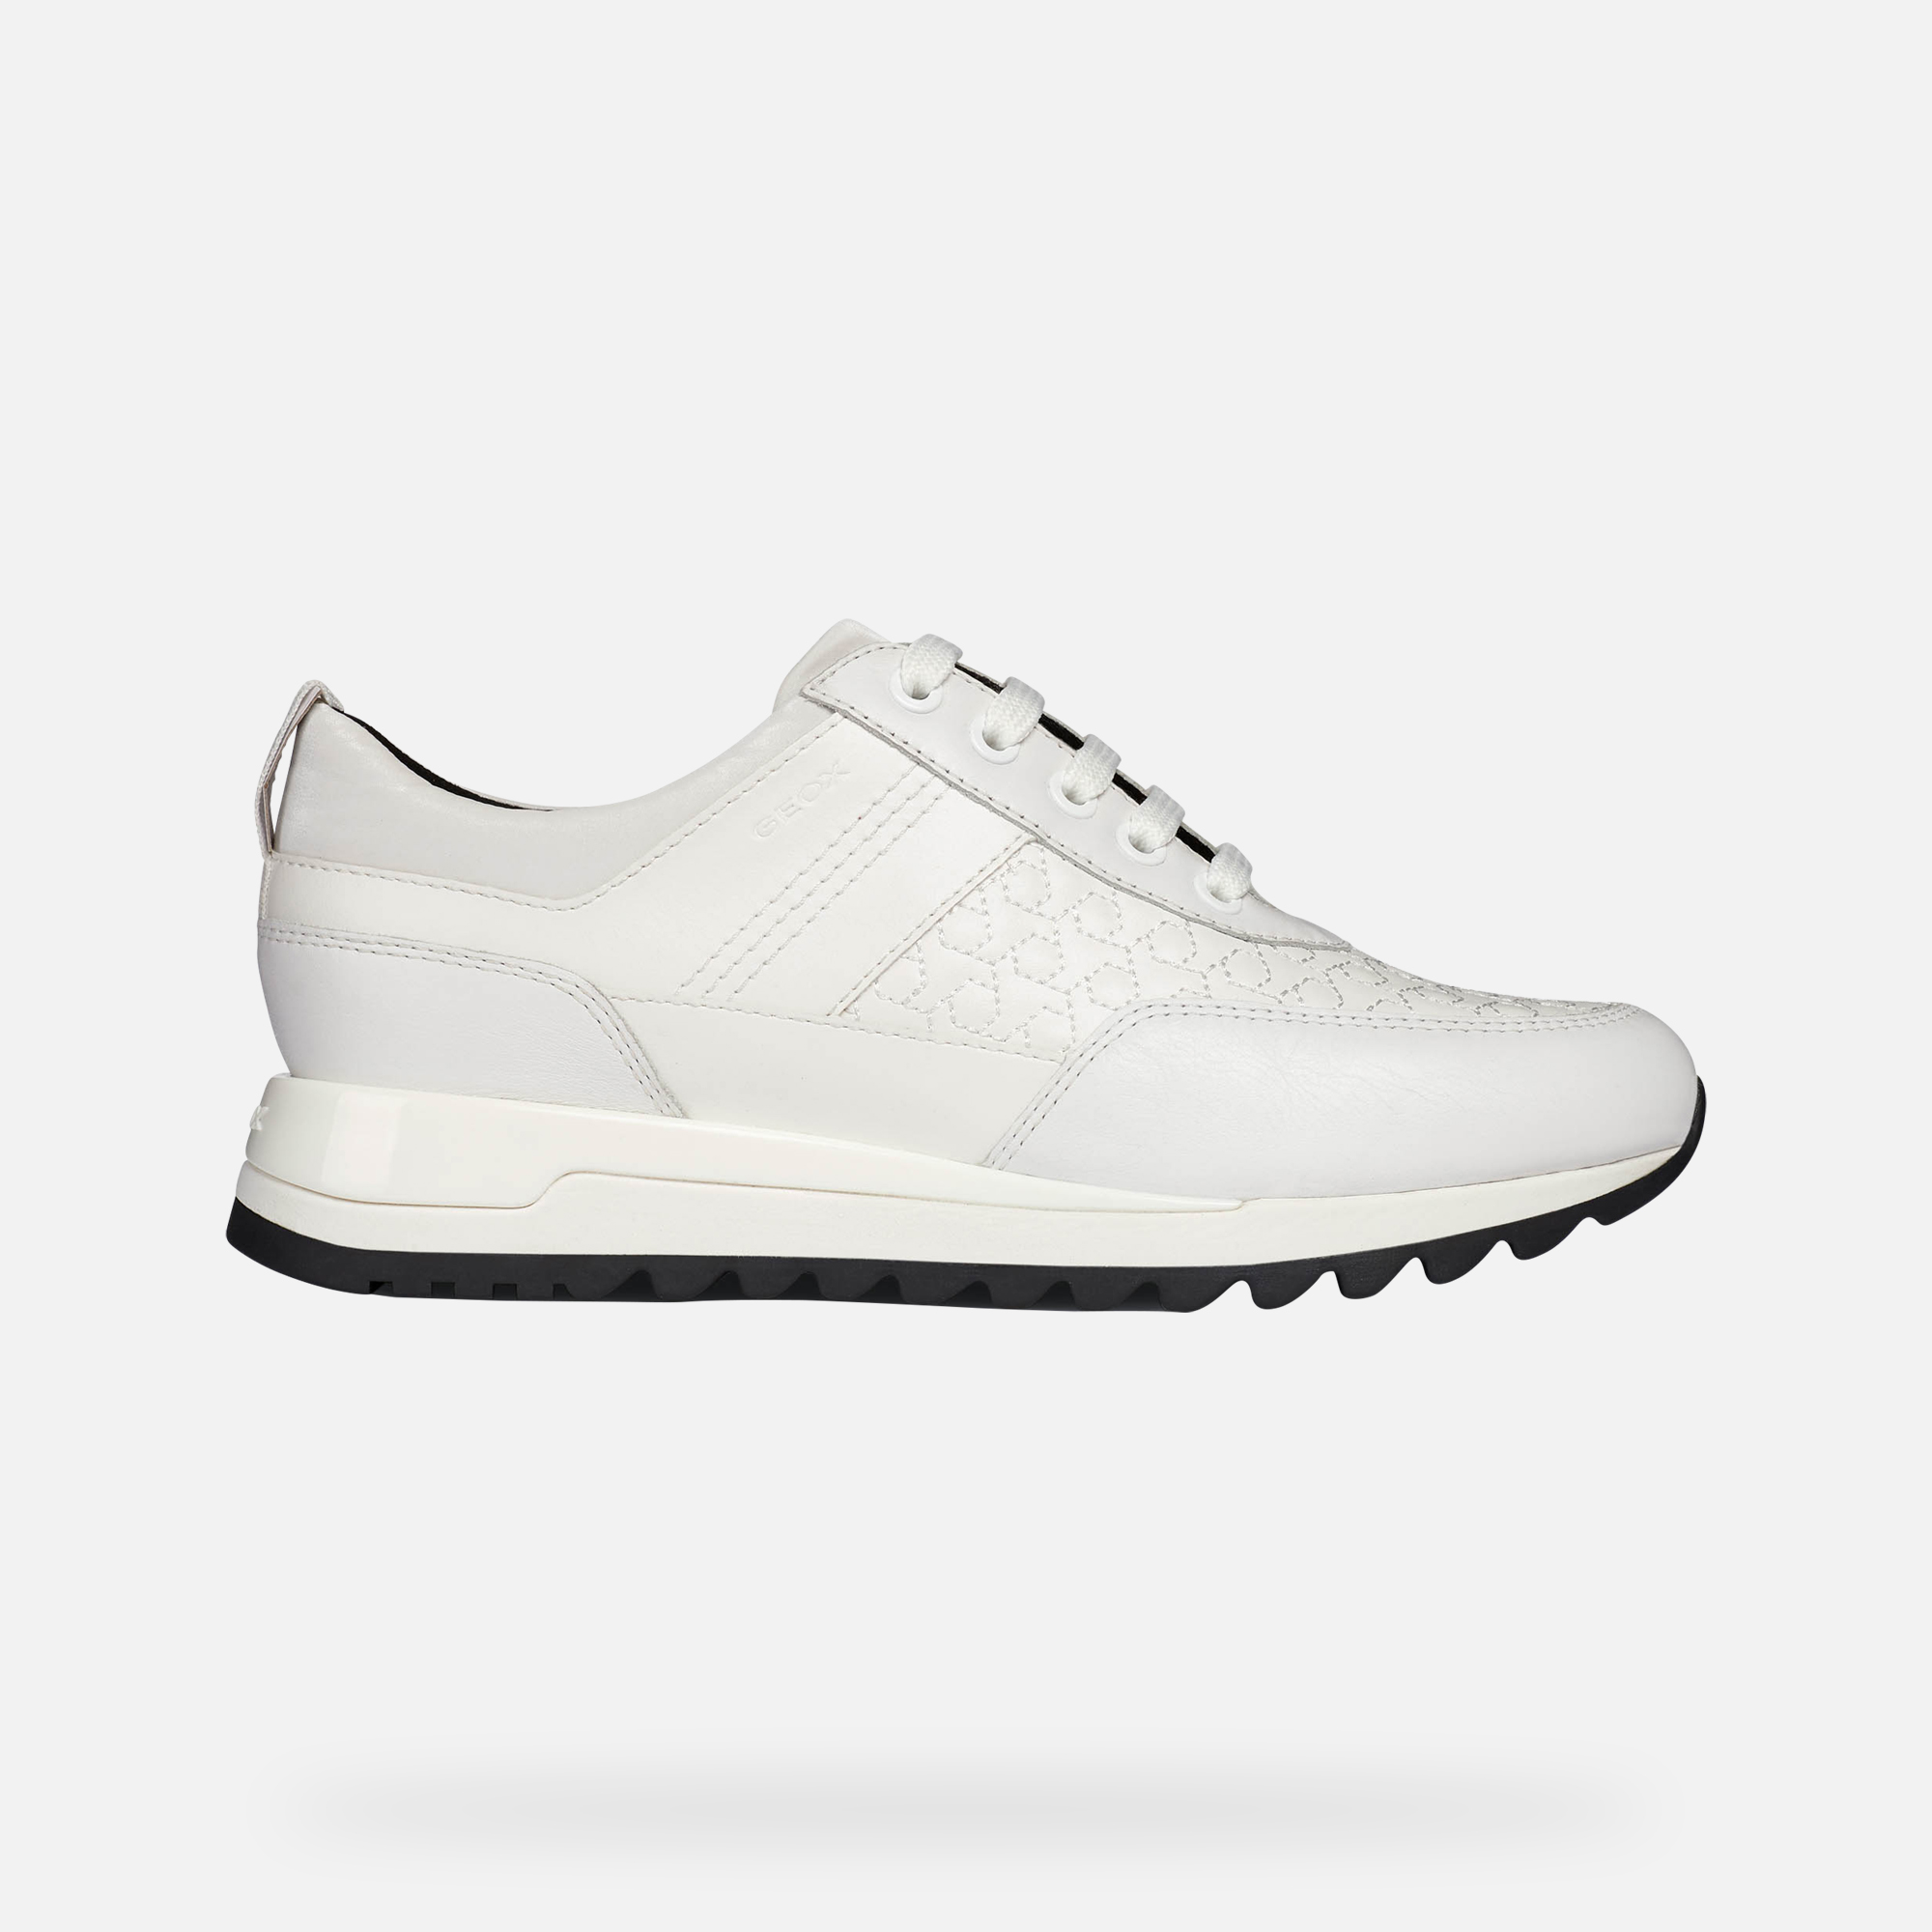 Donna Tabelya Tabelya Da Geox Sneakers Da Sneakers Geox Donna pwqr0wZ1P